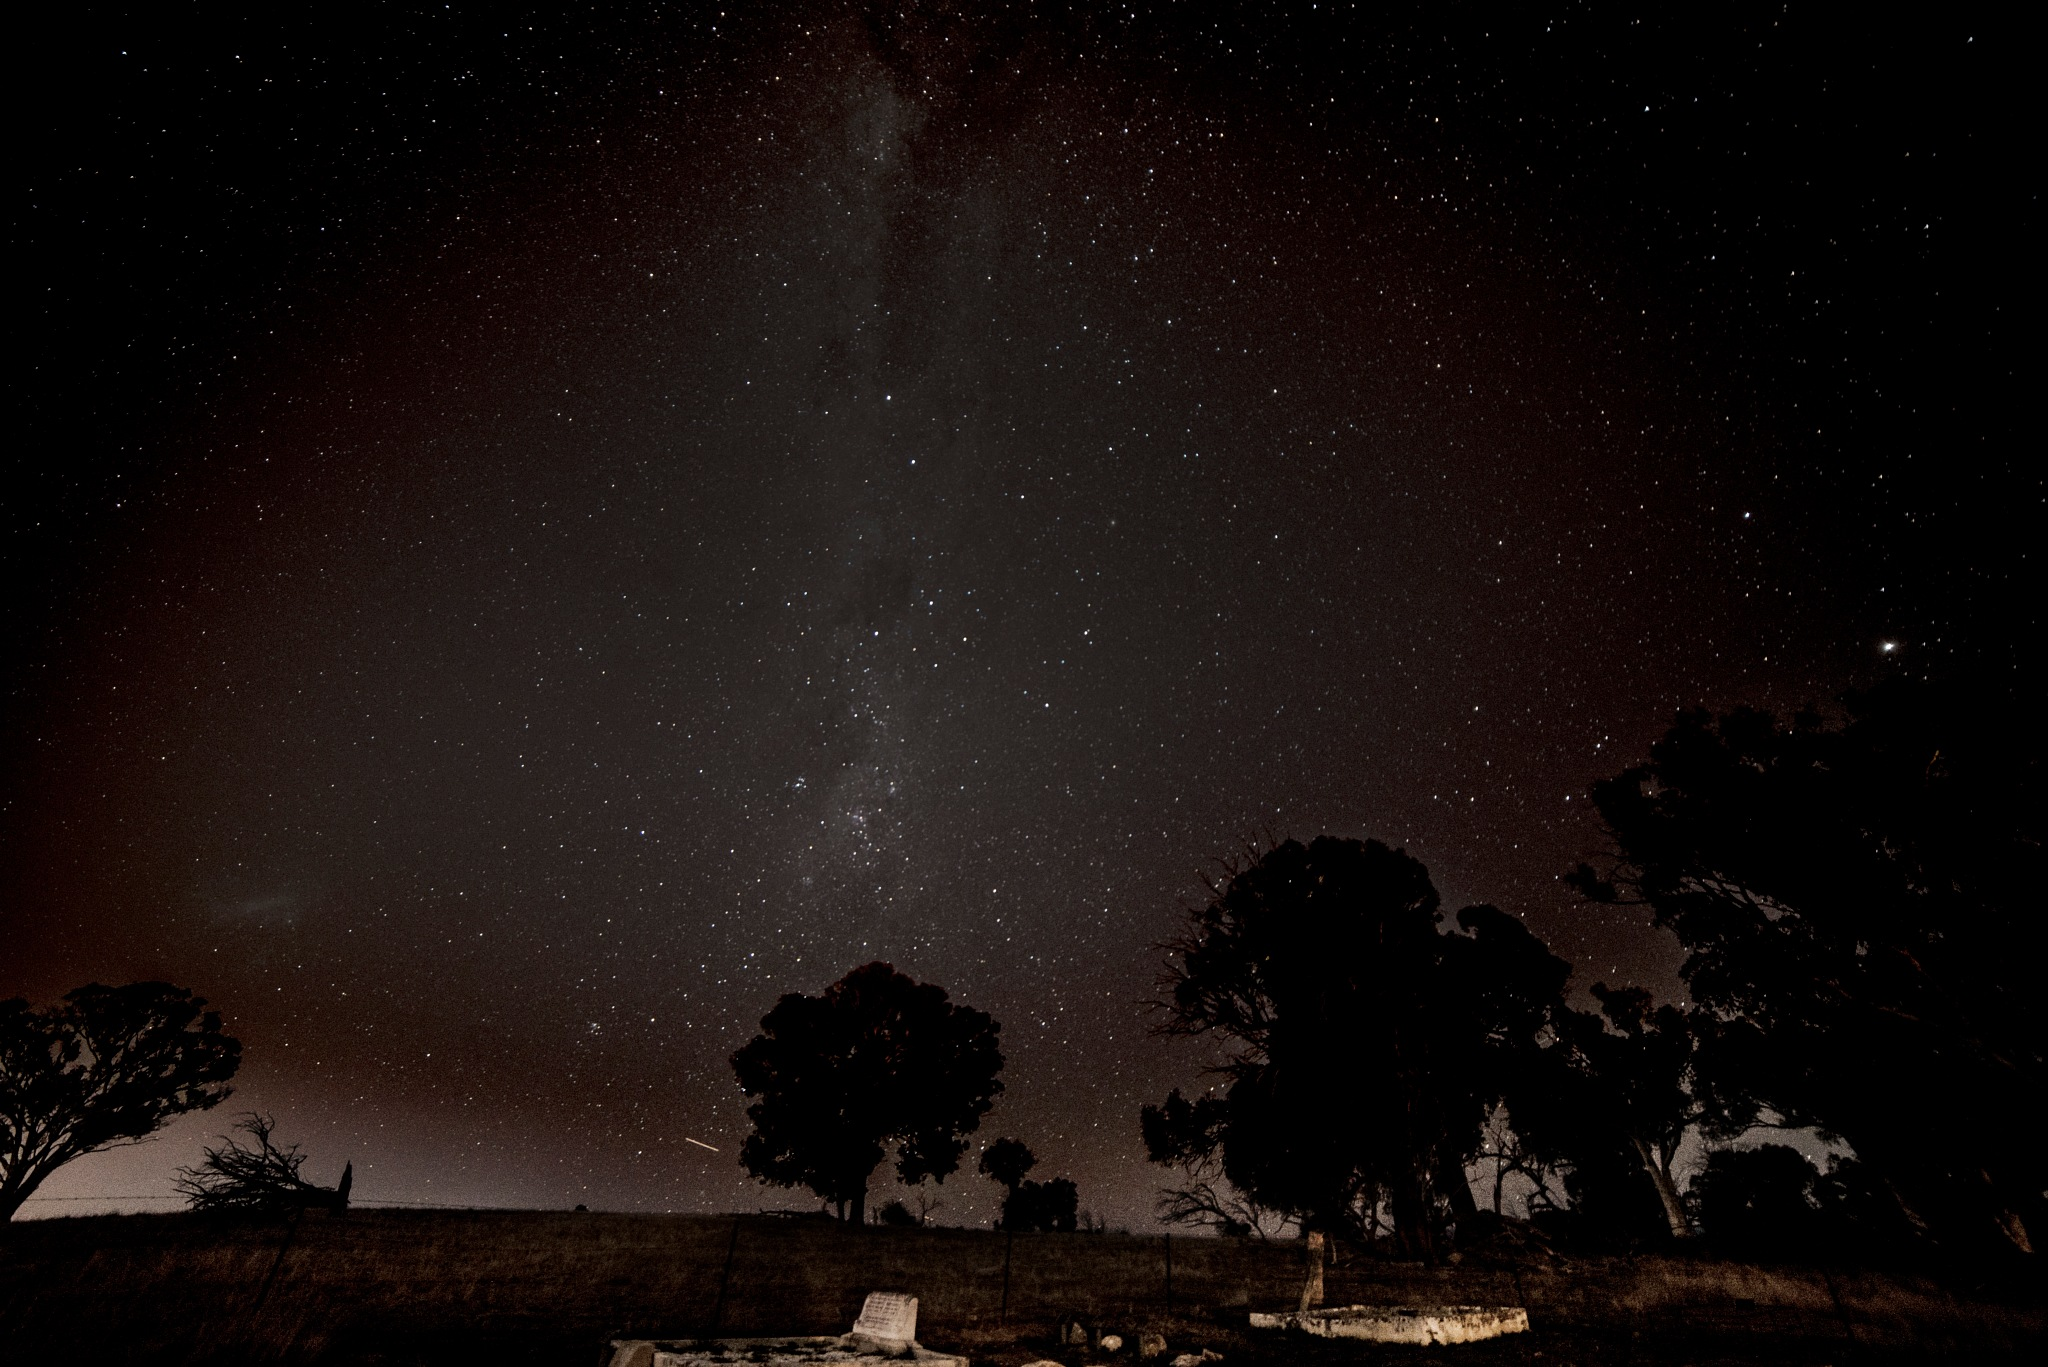 Graveyard Under the Stars by Graham Levi